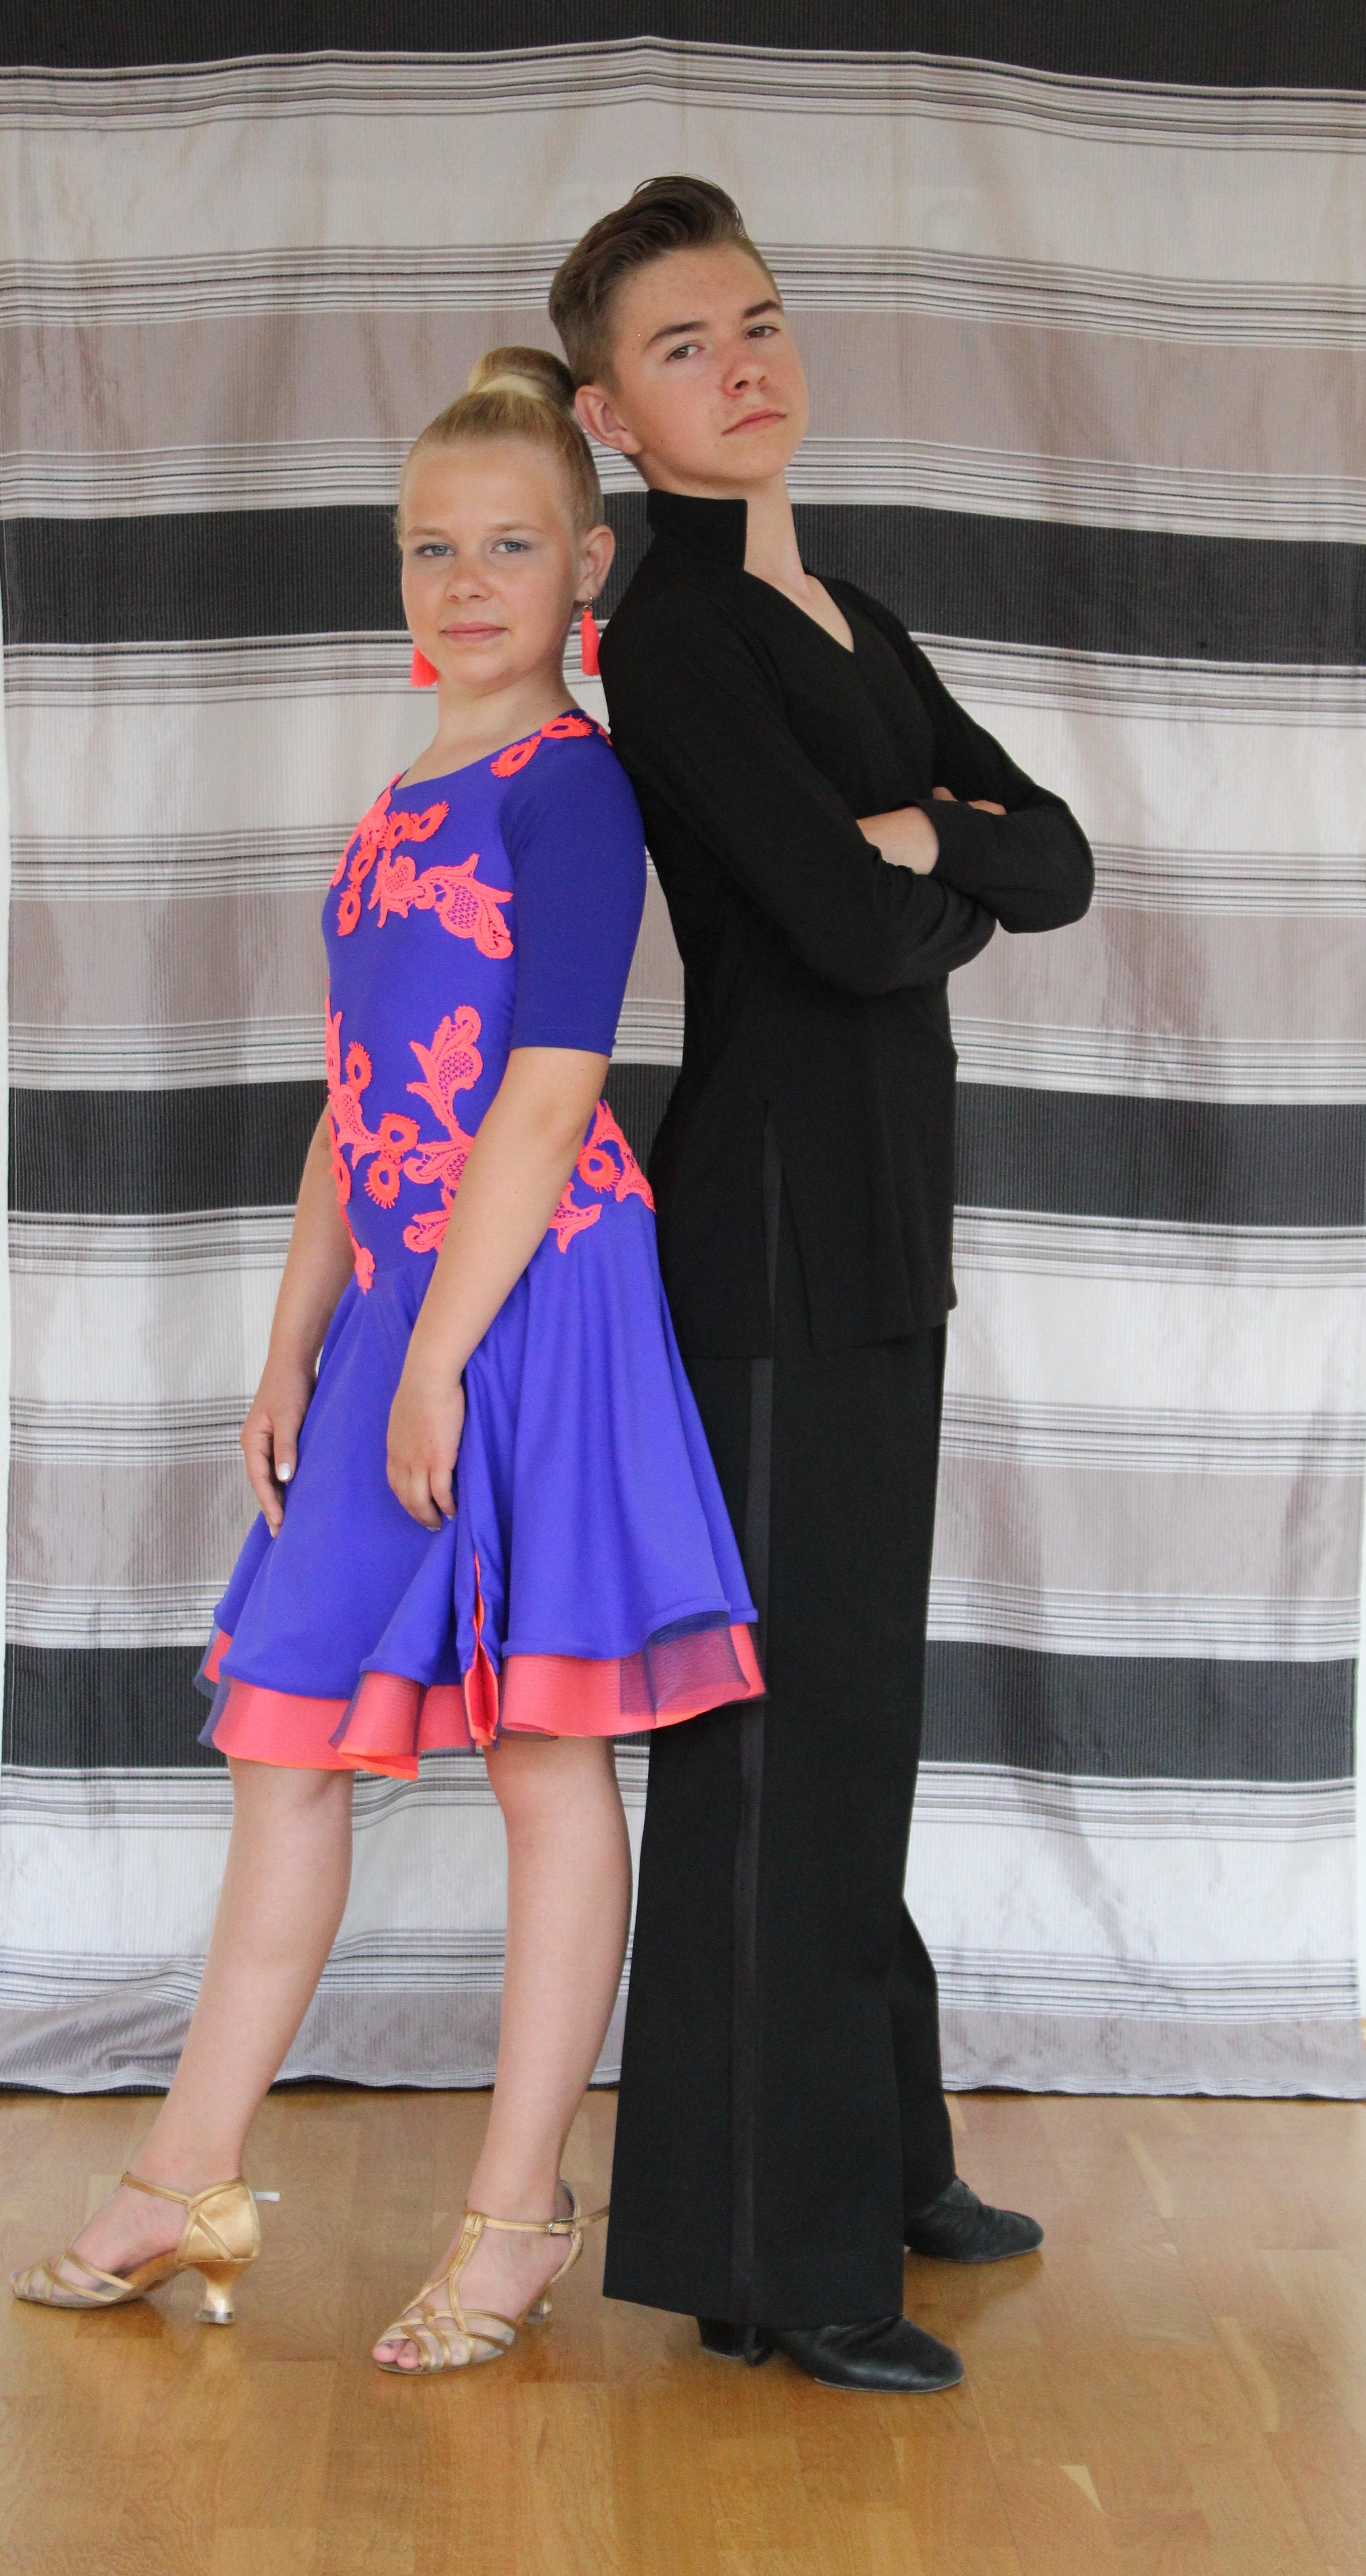 Yannick Pochner & Lina Herrmann